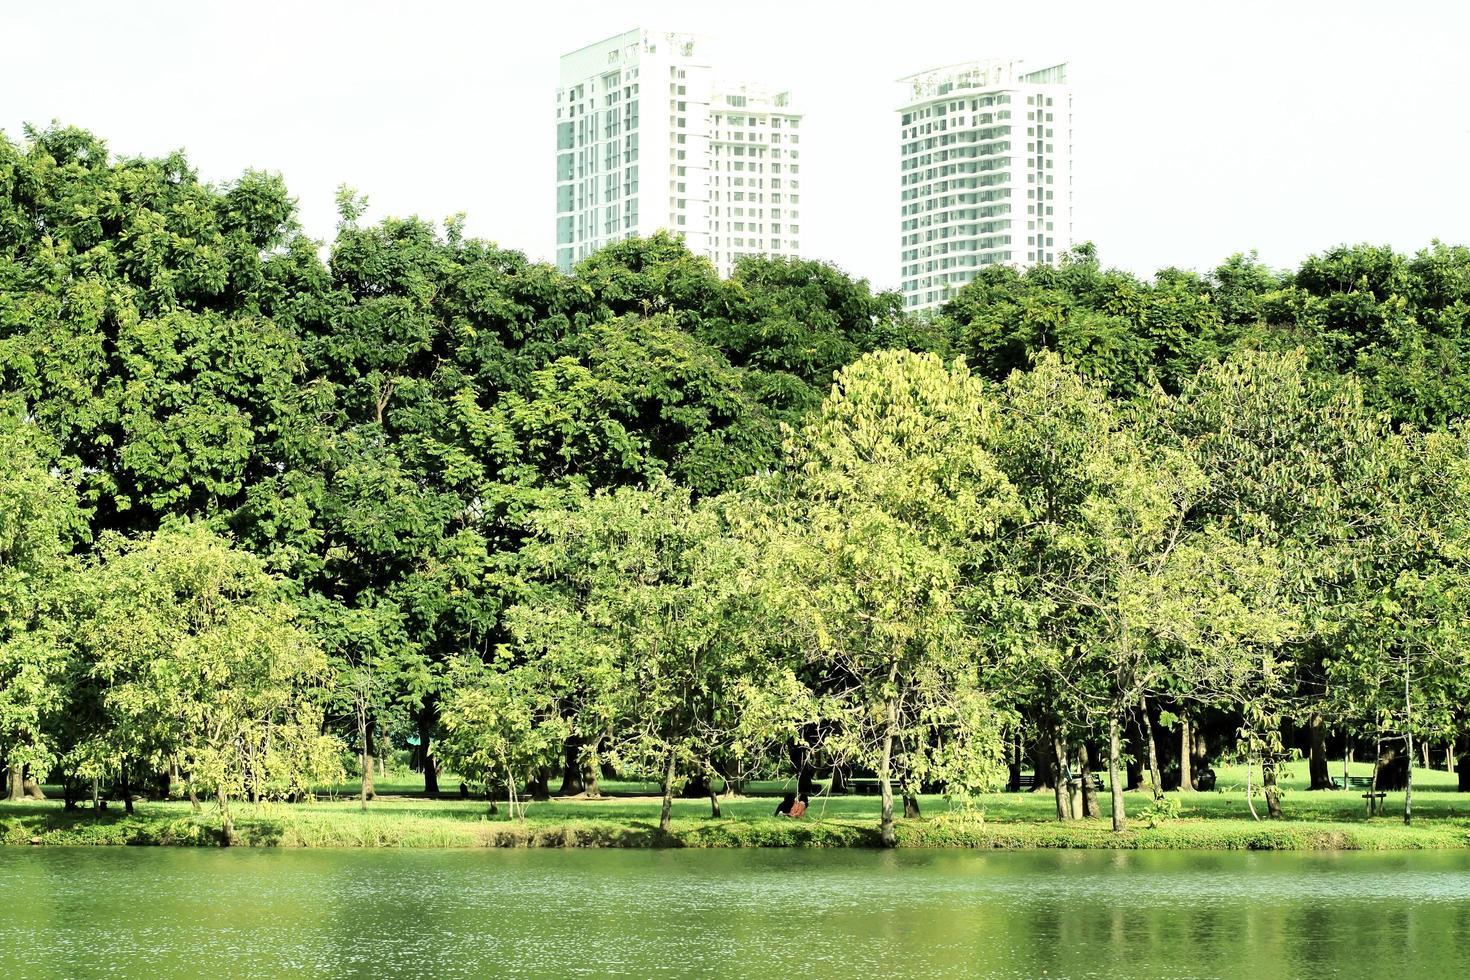 stadspark med skyskrapor bakom träd foto